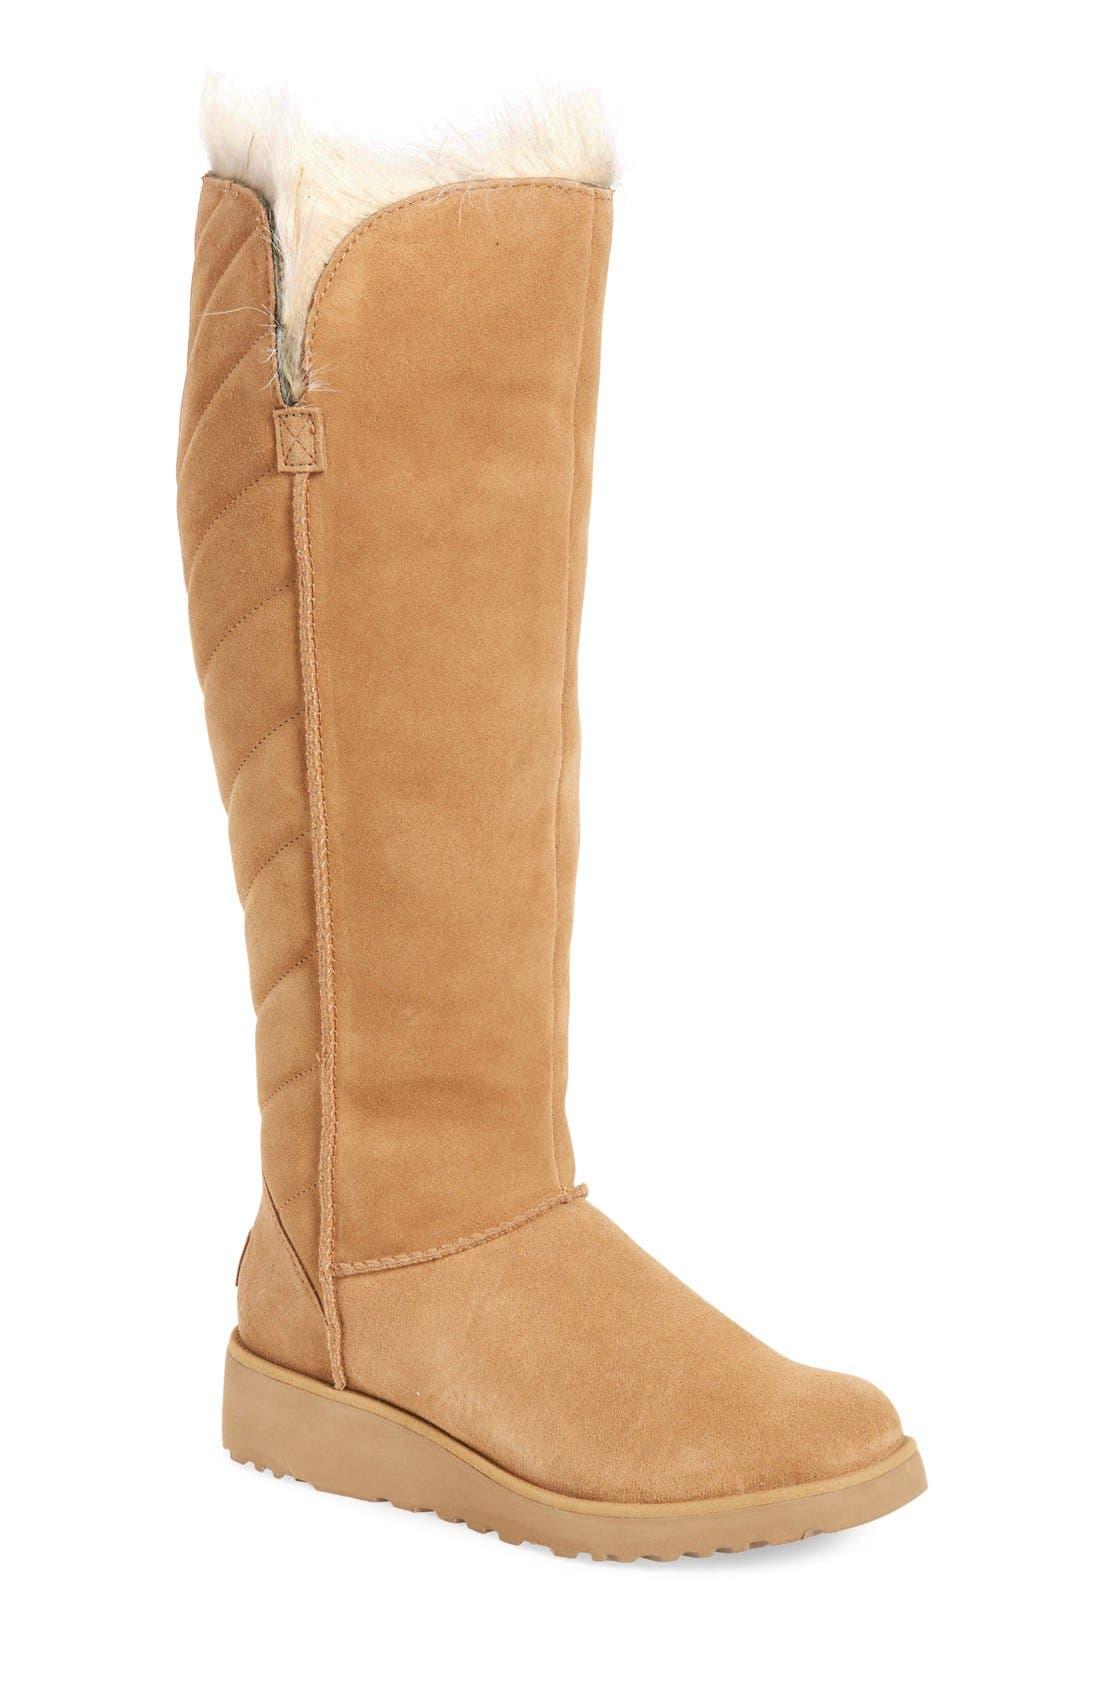 Alternate Image 1 Selected - UGG® 'Rosalind' Tall Boot (Women)